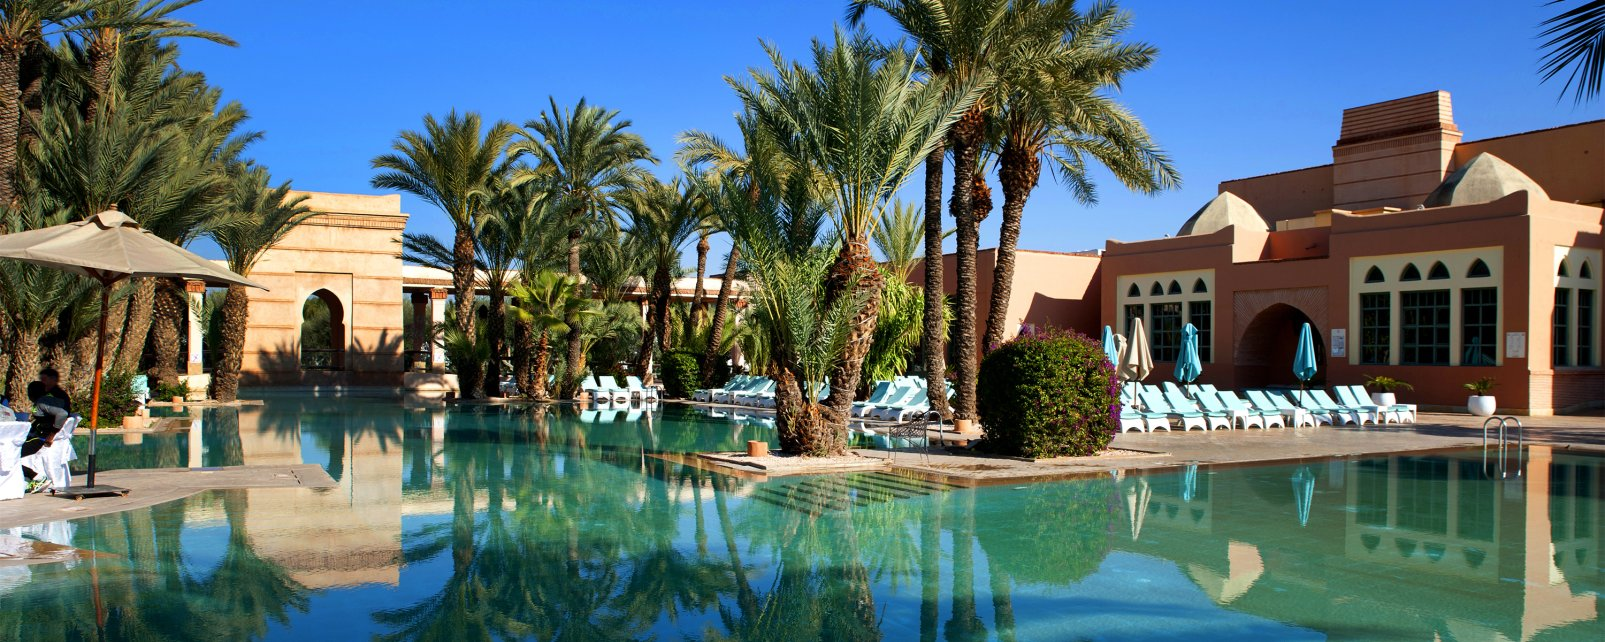 Club Med Marrakech la Palmeraie 2014 Hôtel Club Med la Palmeraie